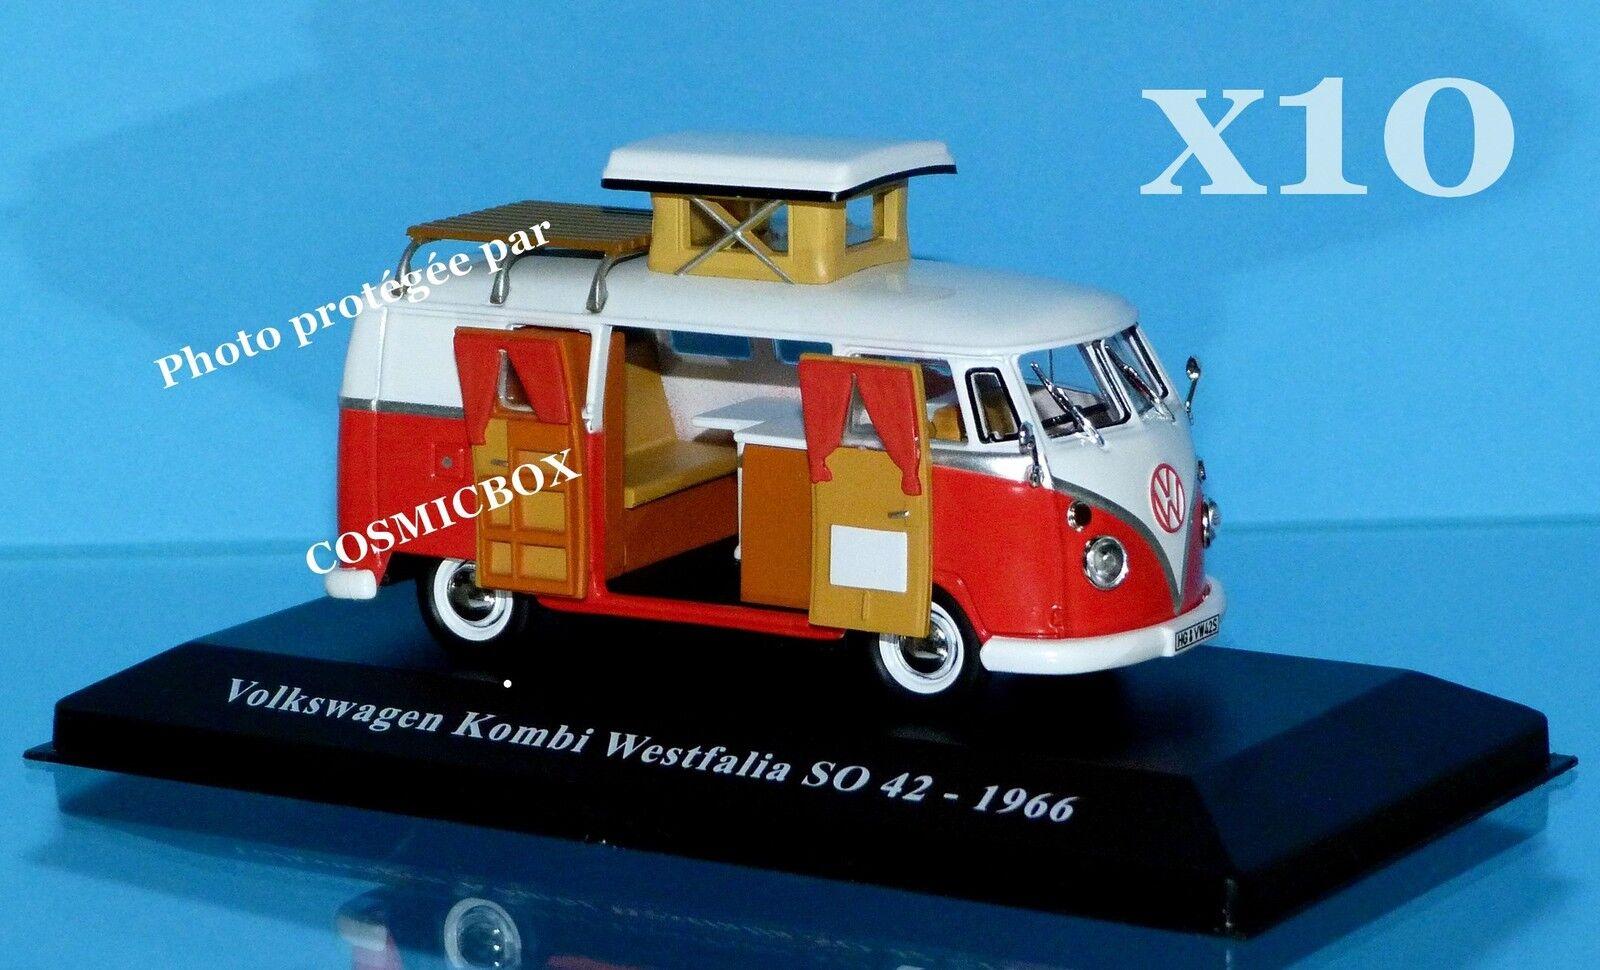 Prize of 10 camping-car VOLKSWAGEN KOMBI WESTFALIA SO 42 1966 kombi camper van